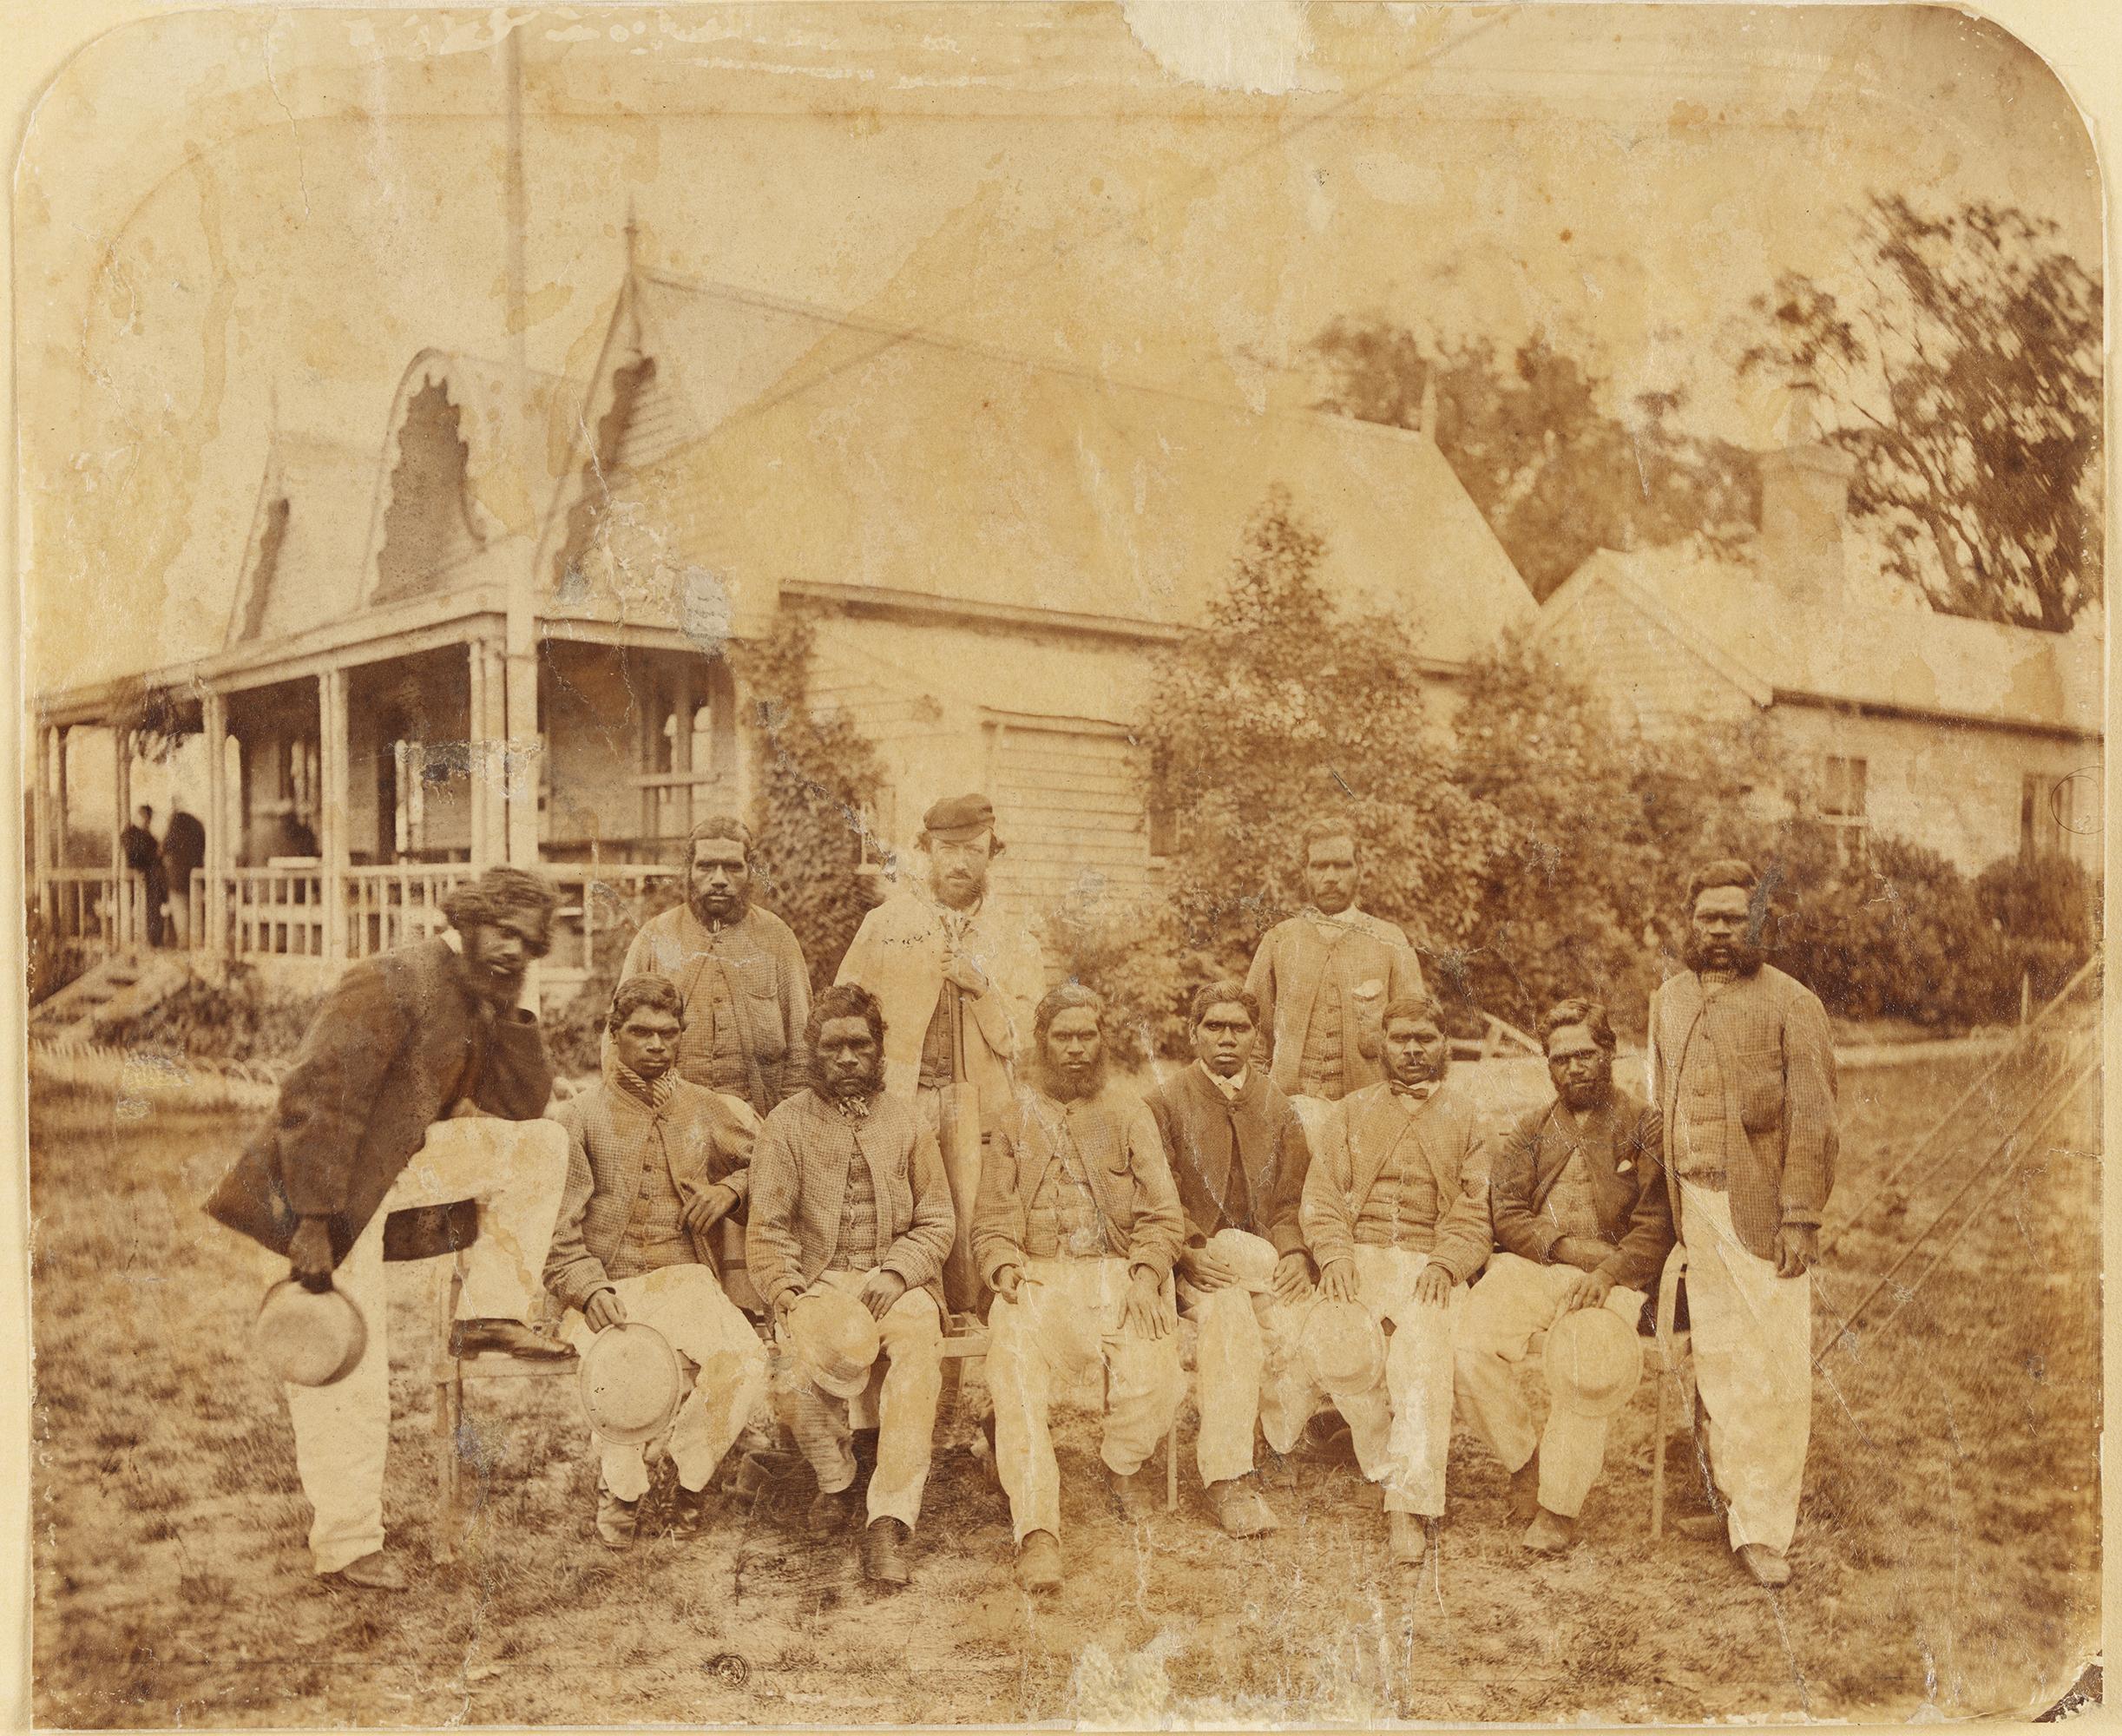 1850 English cricket season